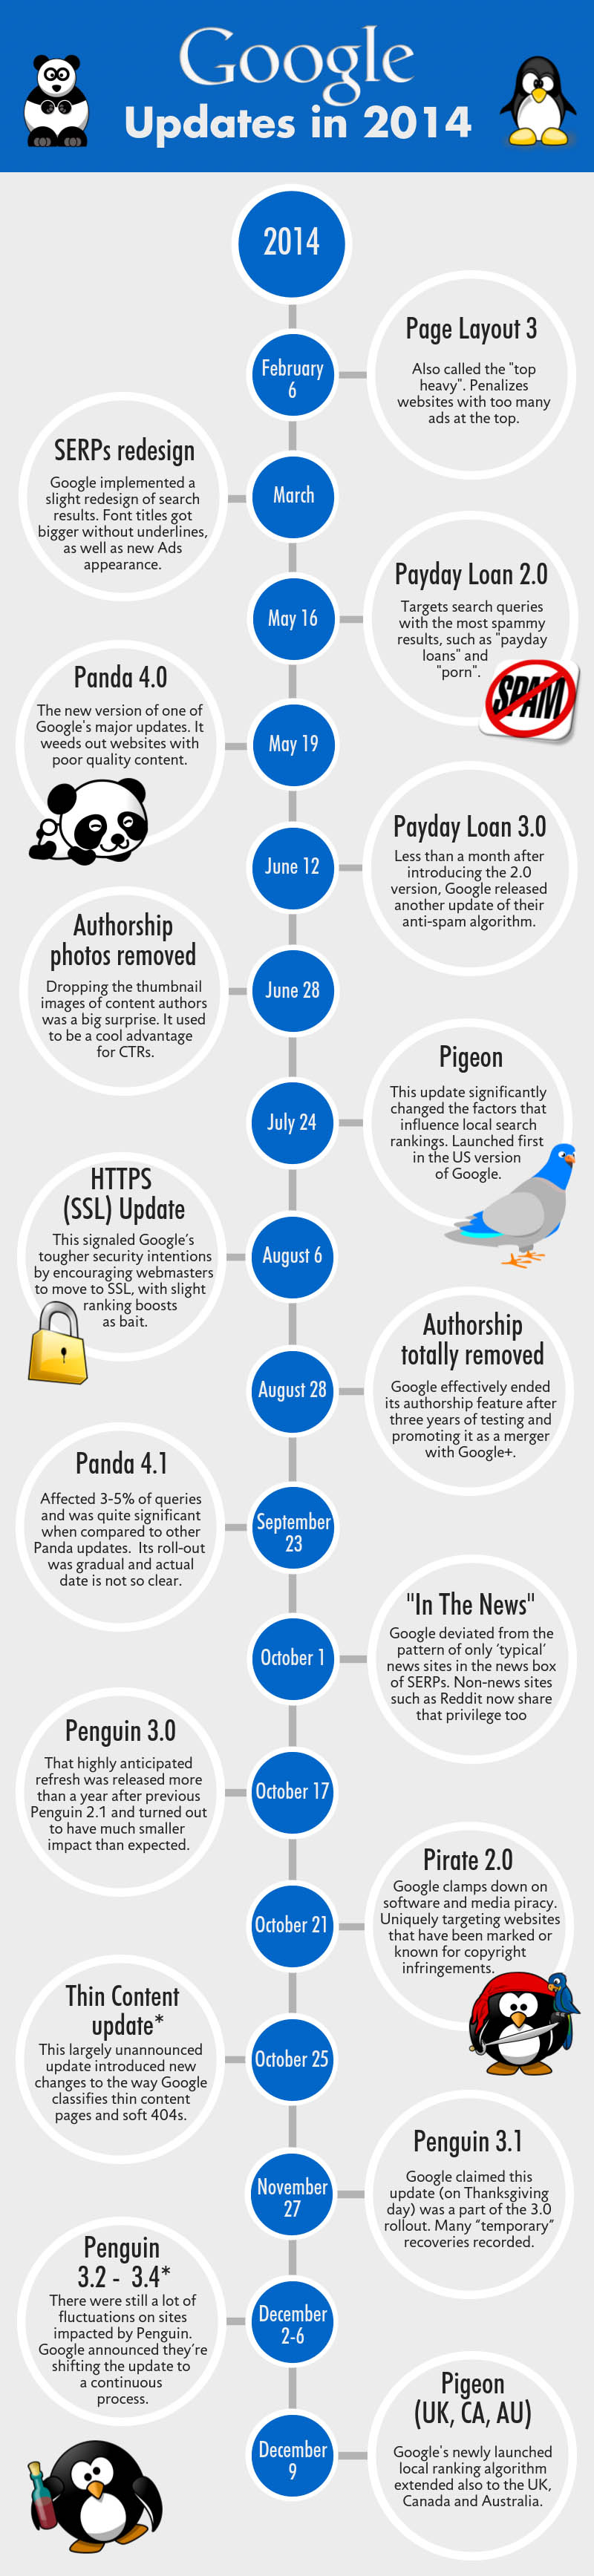 update-Google-2014